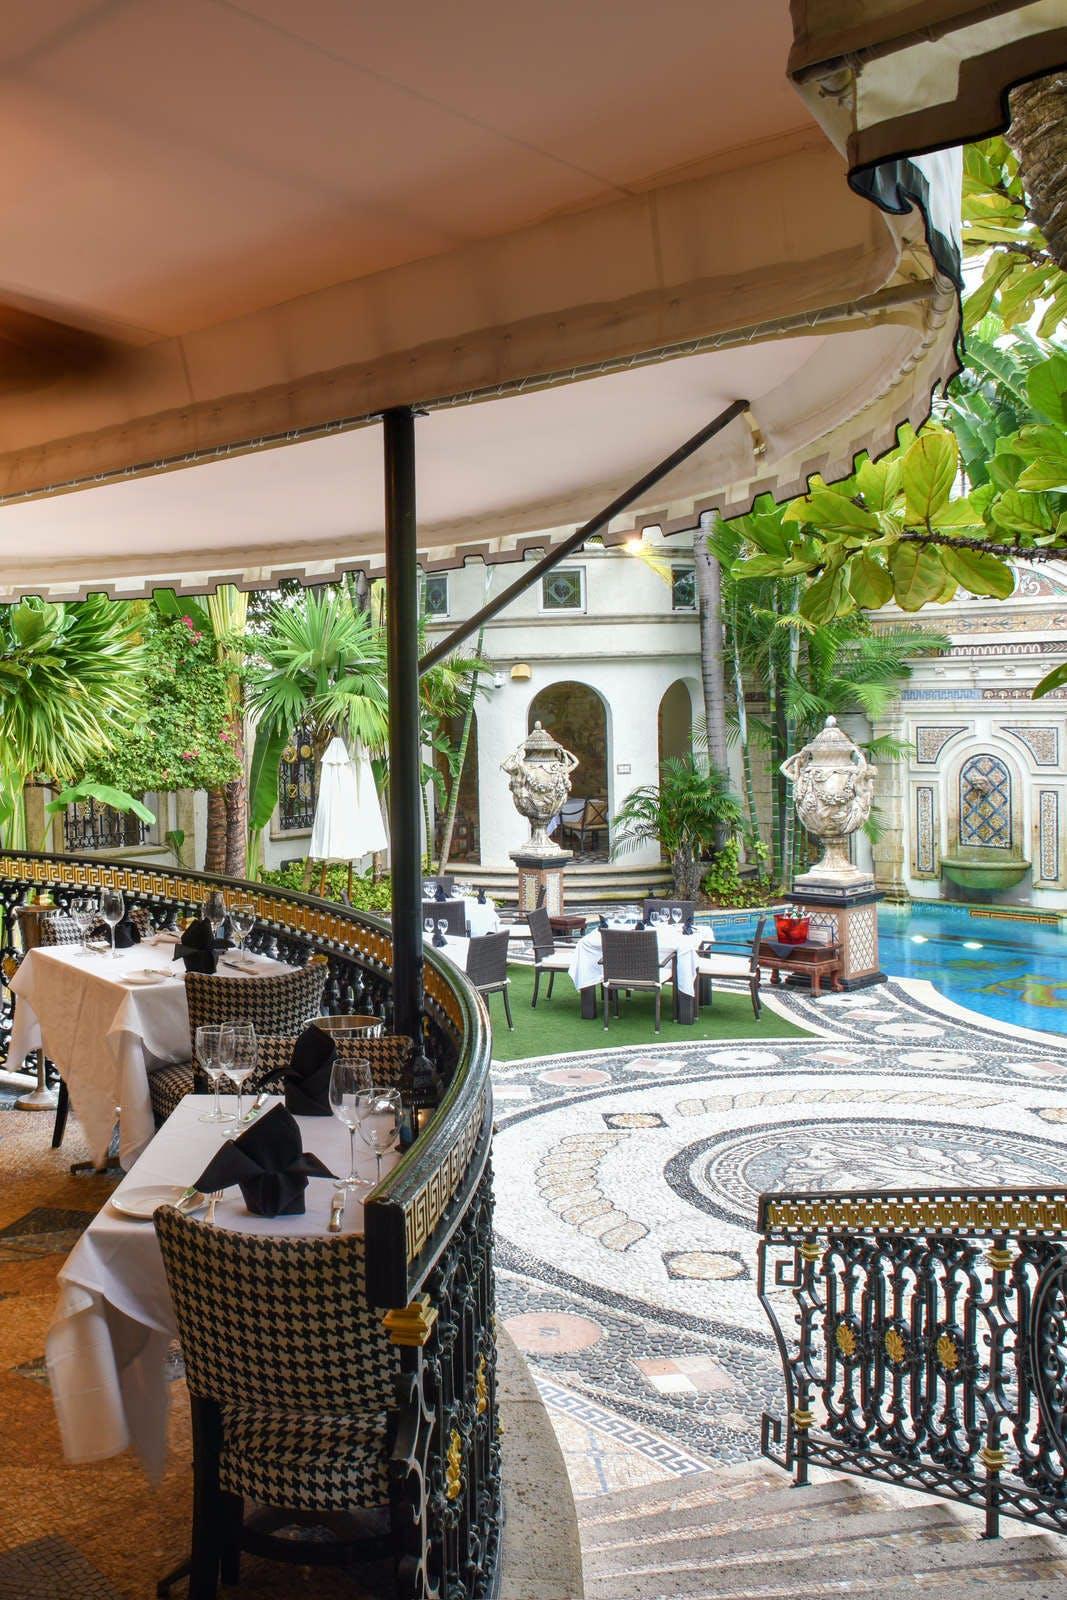 The Villa Casa Casuarina - Former Versace Mansion